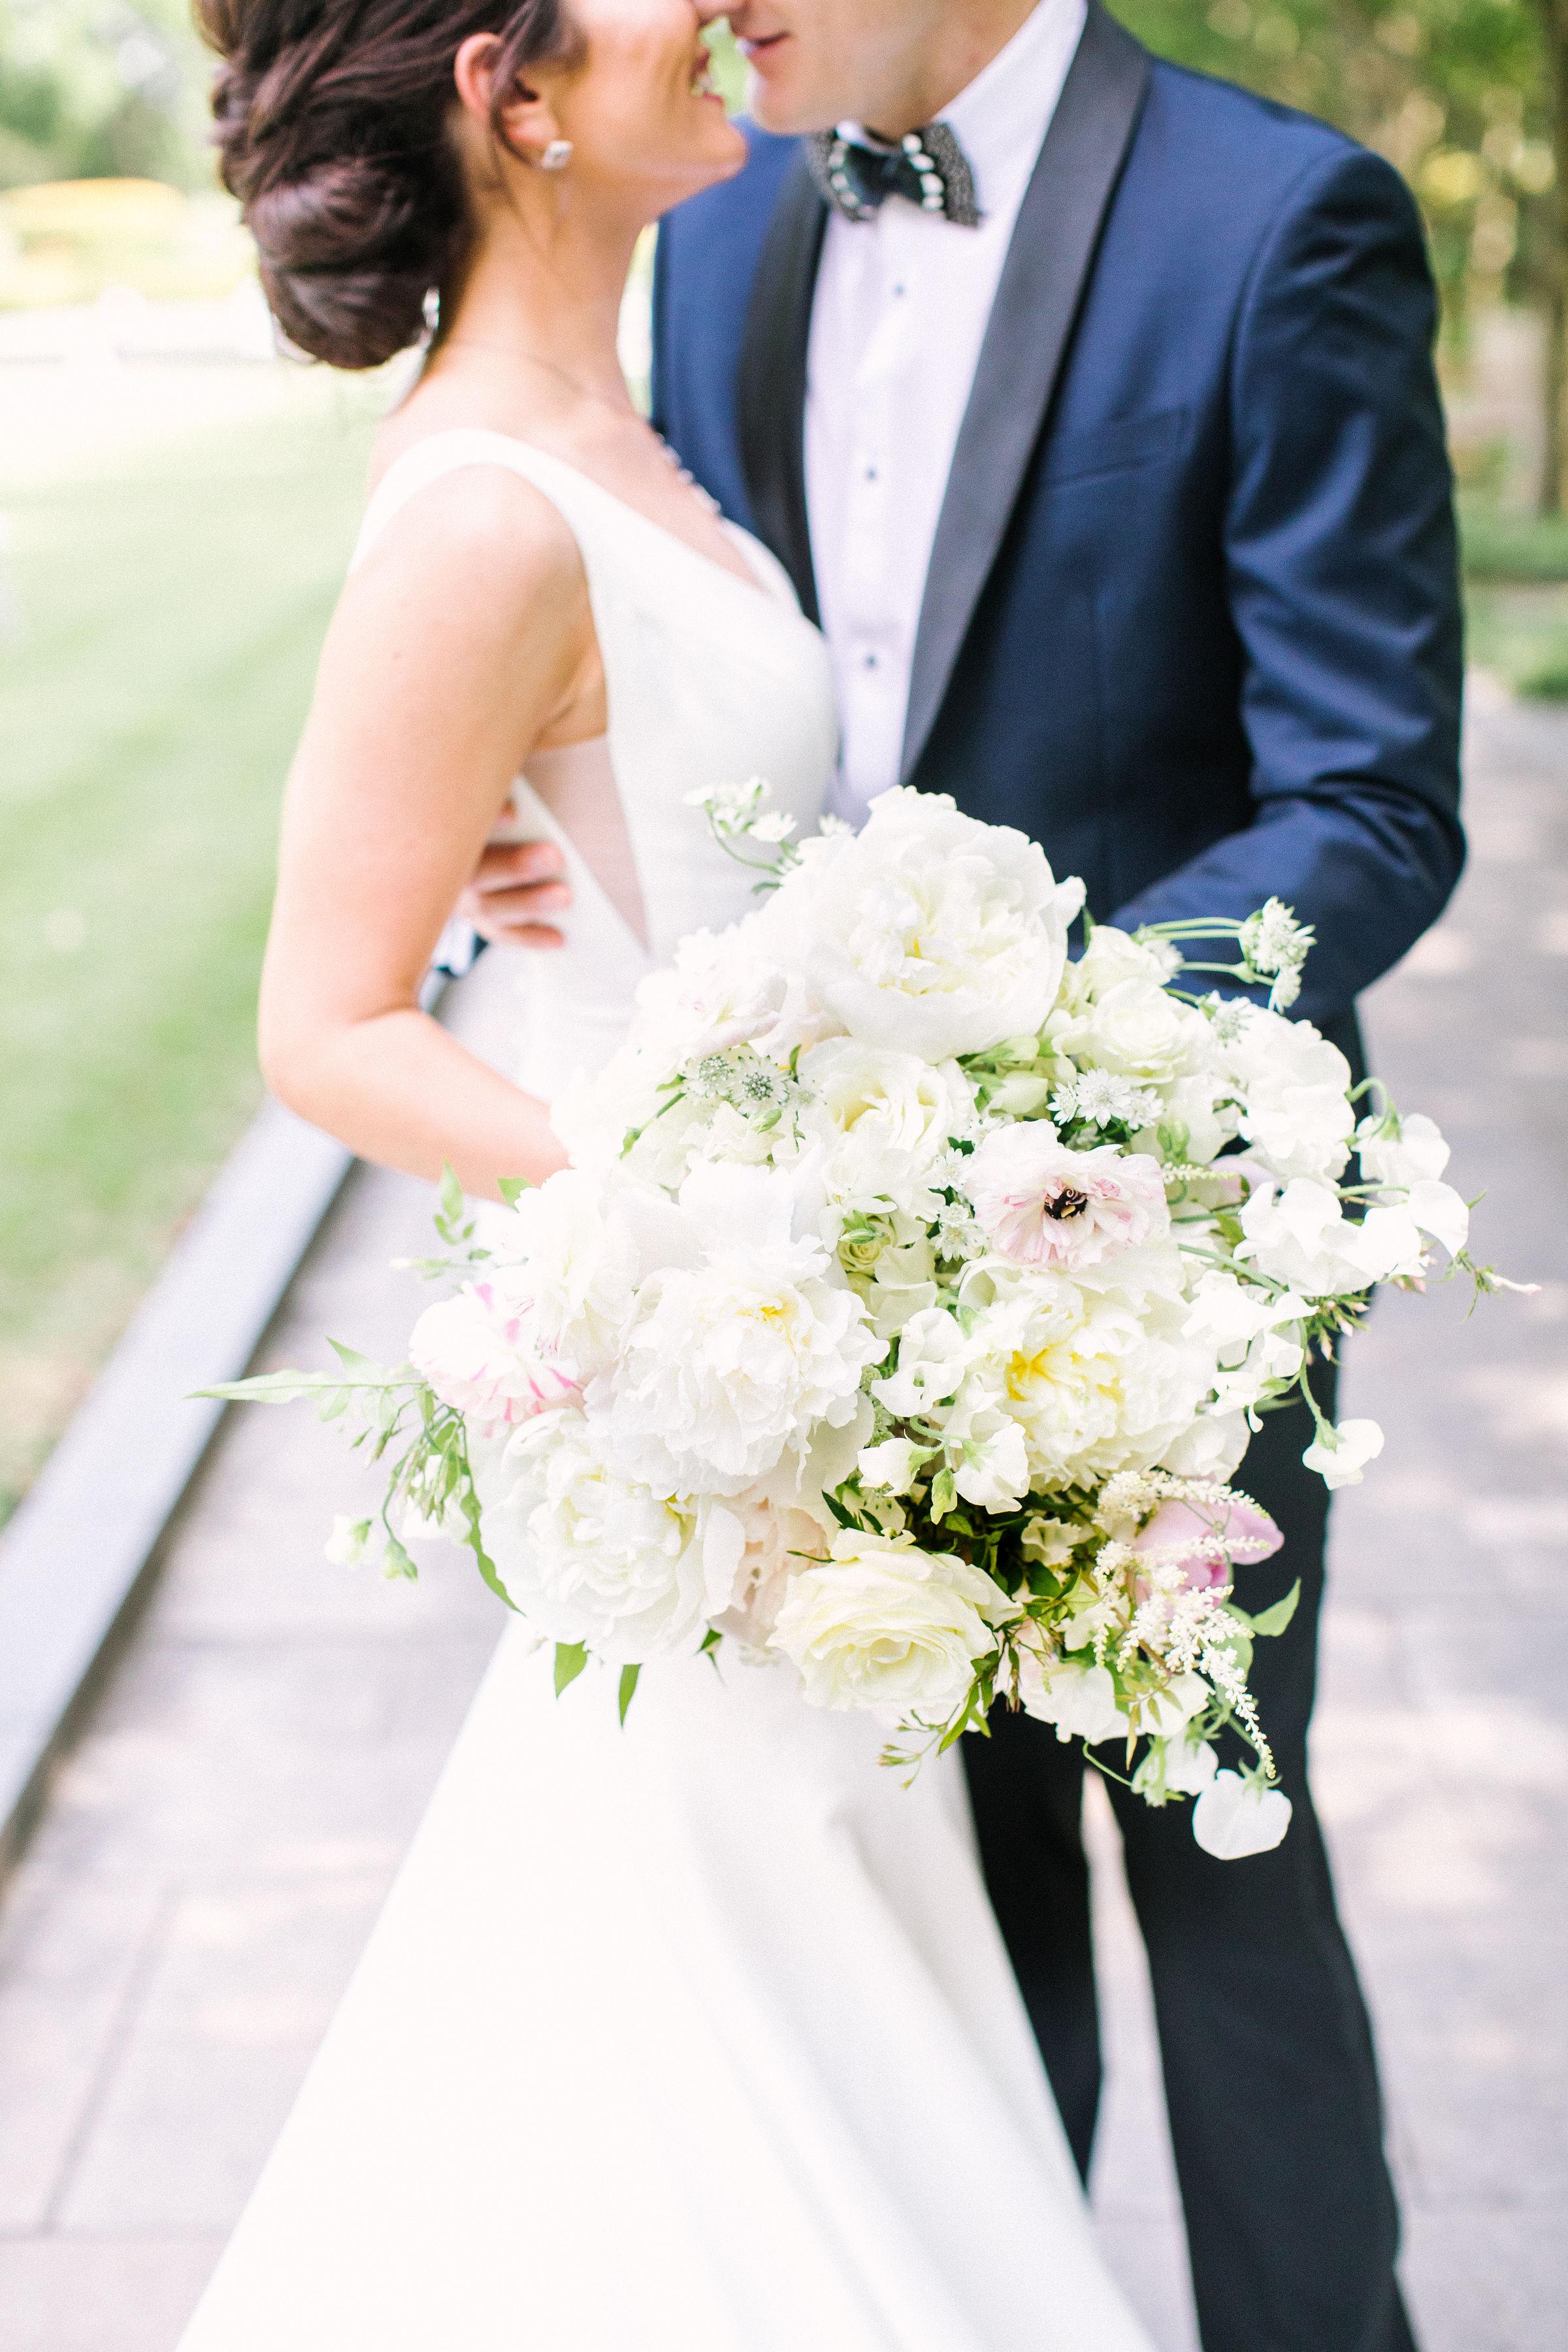 Ellen-Ashton-Photography-Dallas-Wedding-Photographers-Ivory-and-vine-Weddings-222.jpg